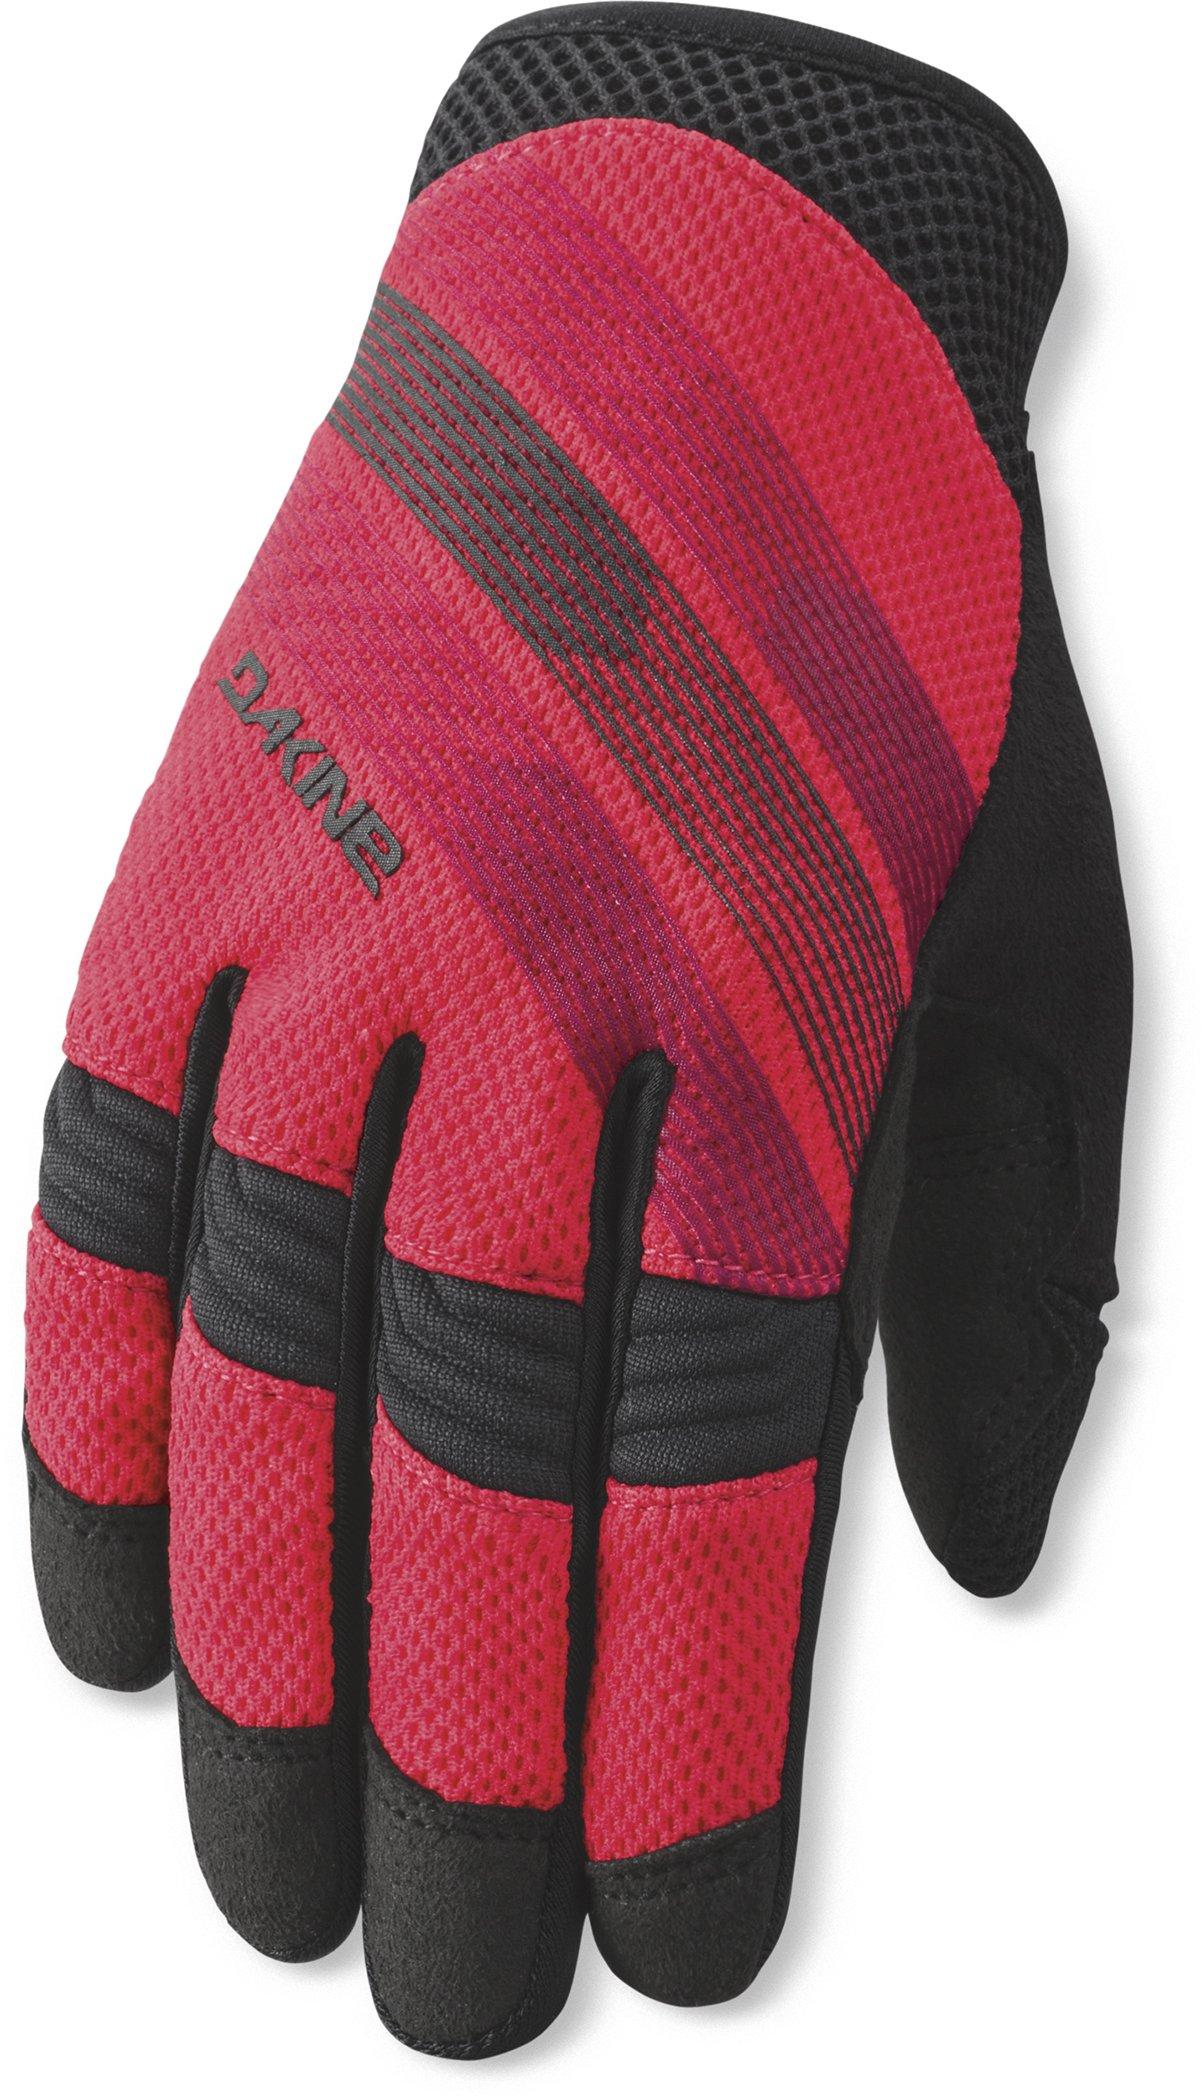 Dakine Women's Covert Bike Gloves, Poppy, XL